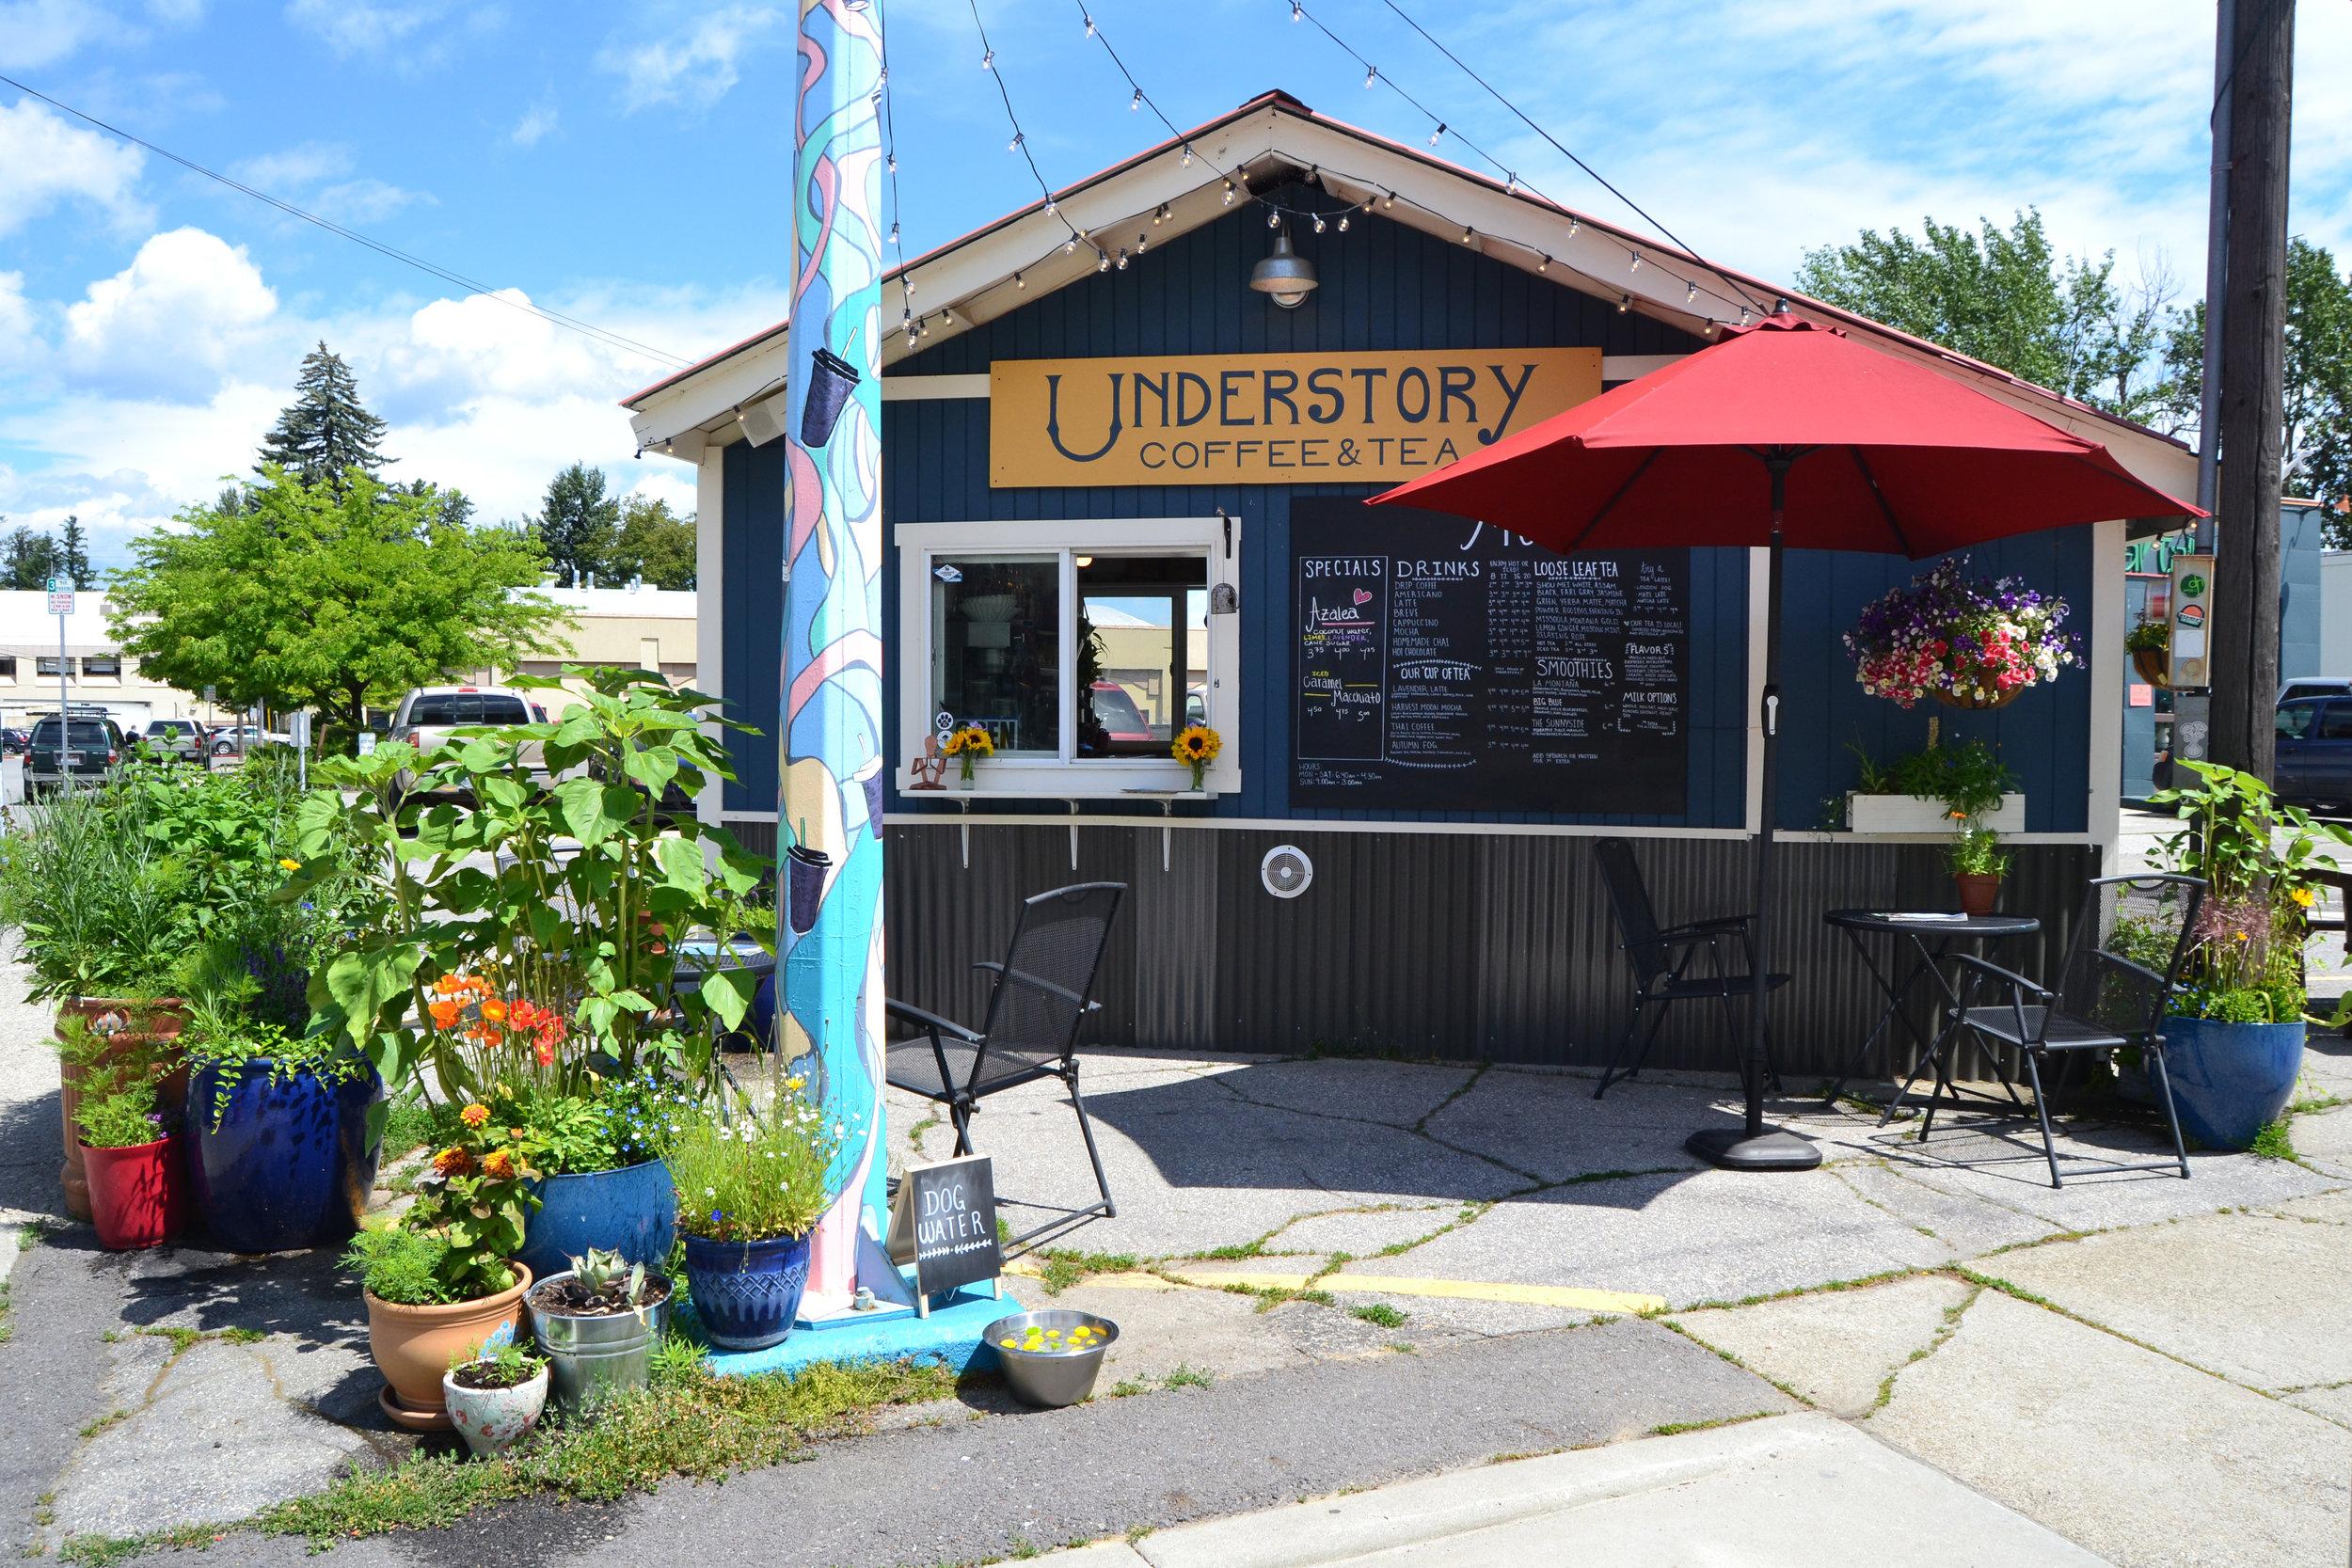 Understory-Coffee-Exterior-Sandpoint-Idaho-Summer.jpg